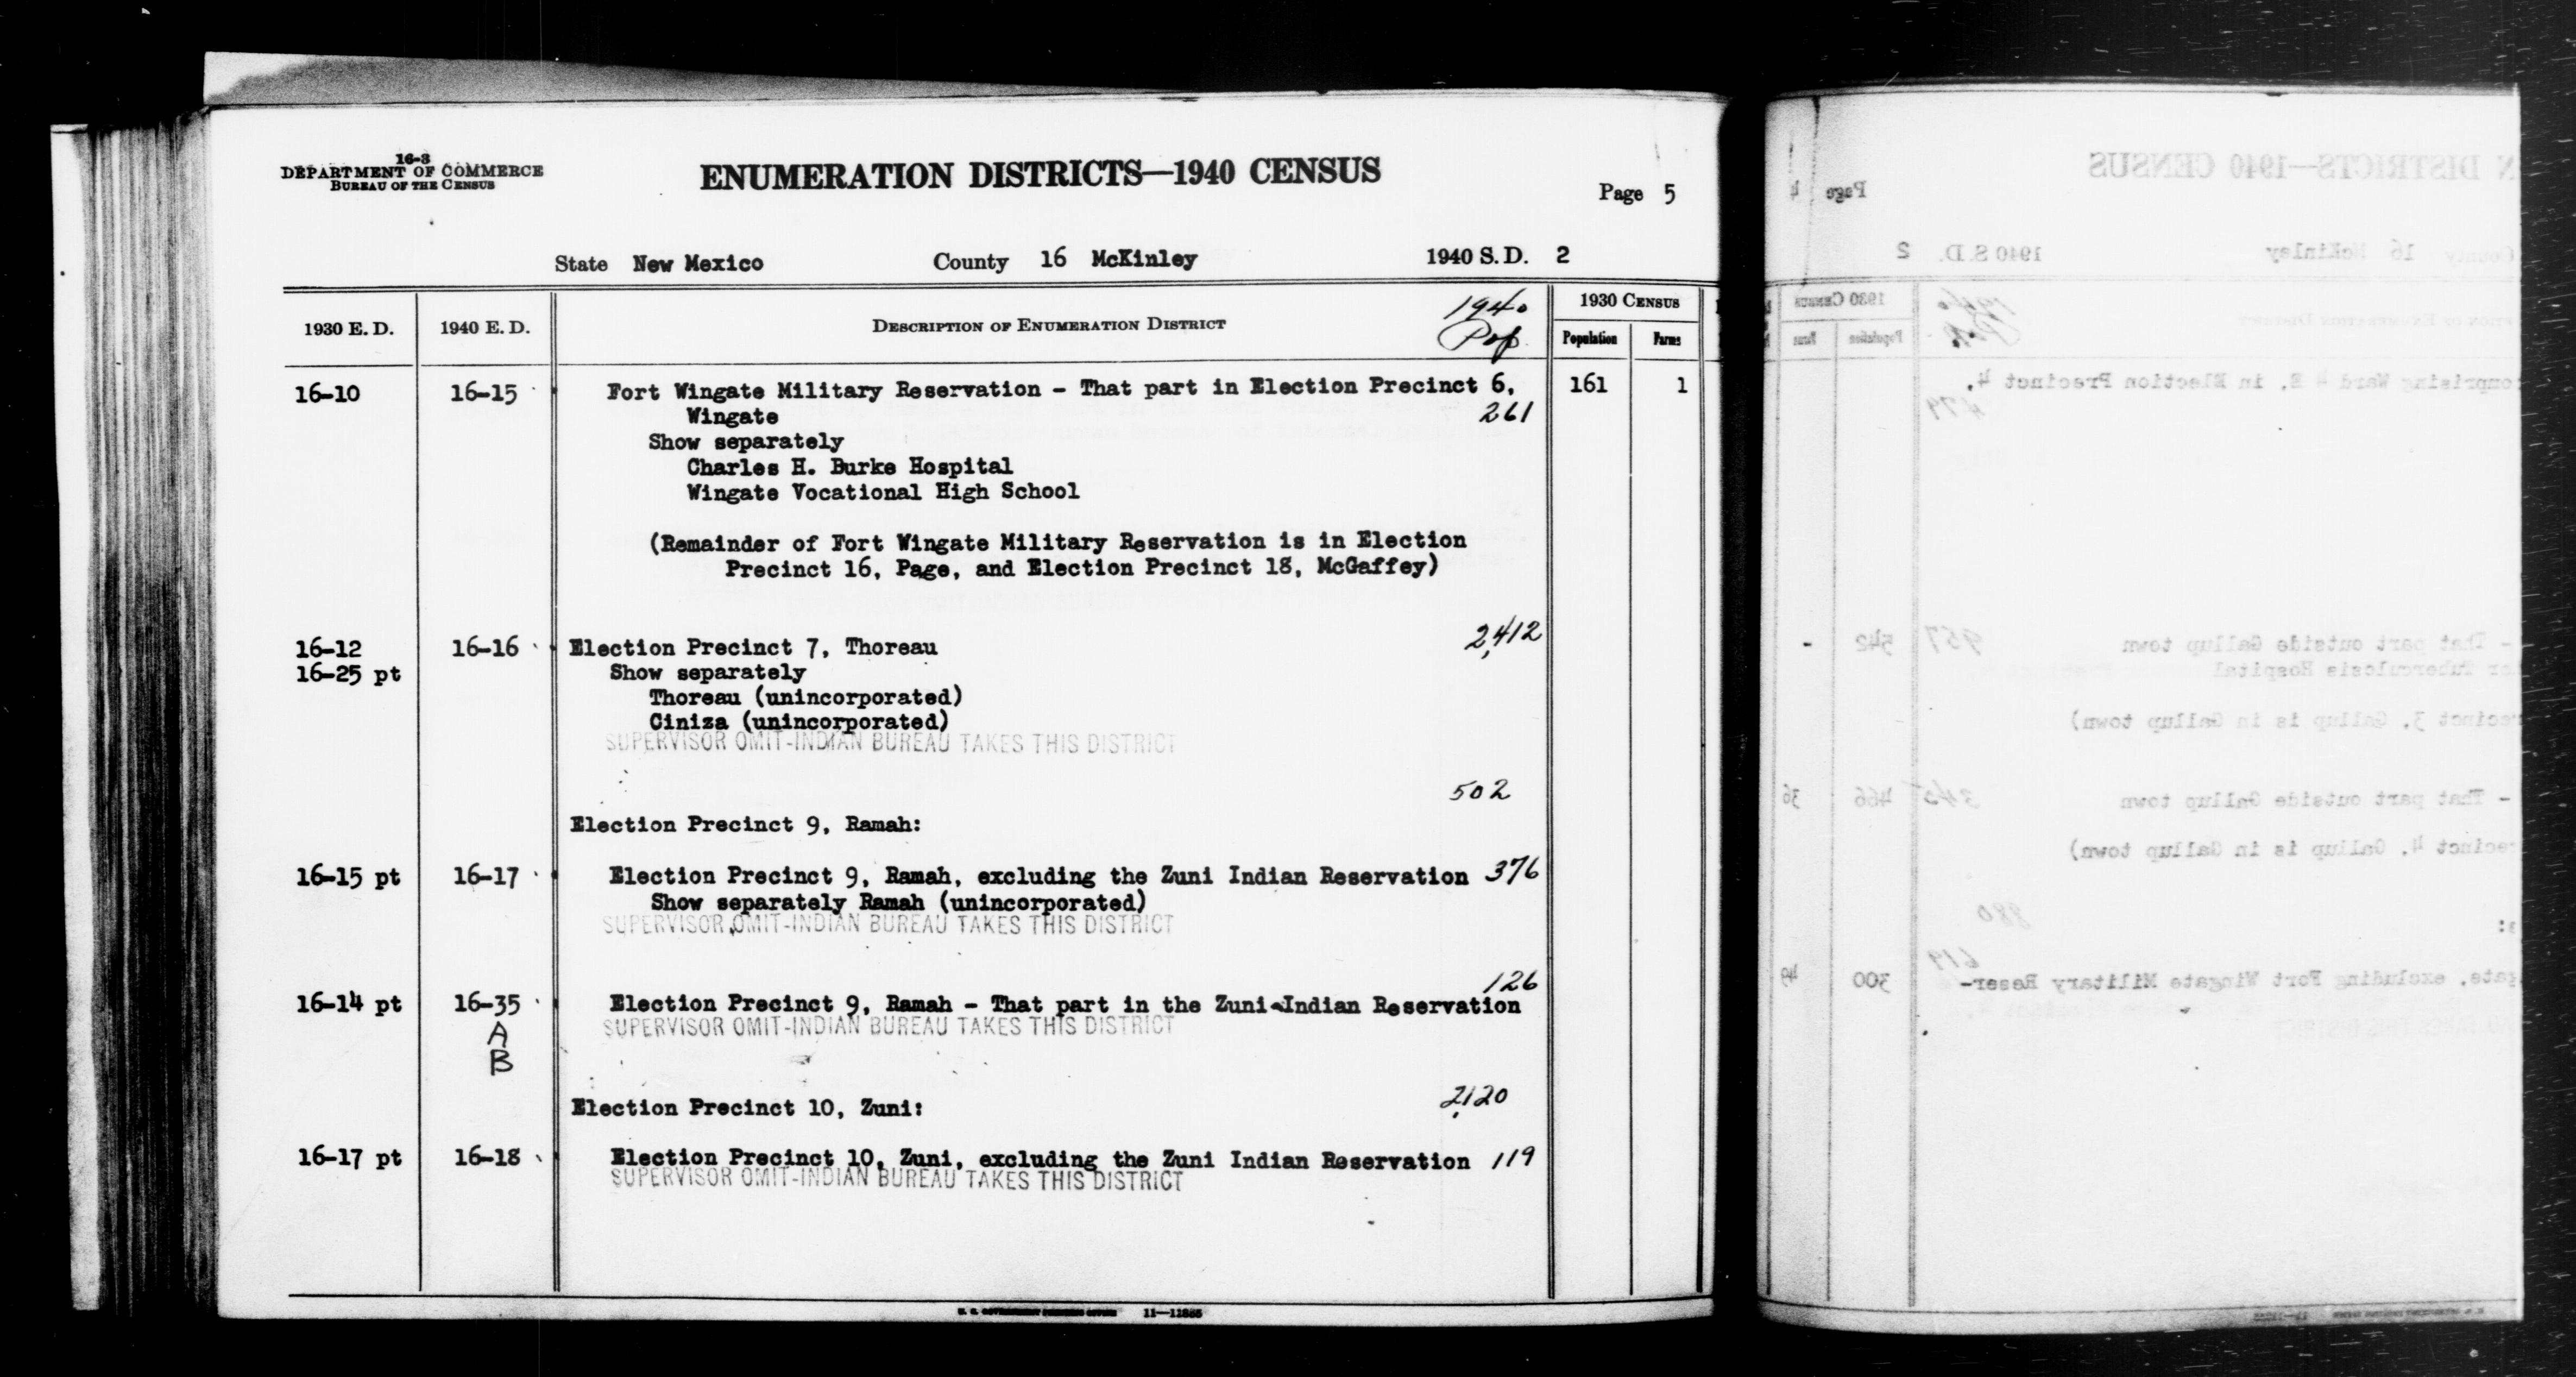 1940 Census Enumeration District Descriptions - New Mexico - McKinley County - ED 16-15, ED 16-16, ED 16-17, ED 16-18, ED 16-35A, ED 16-35B